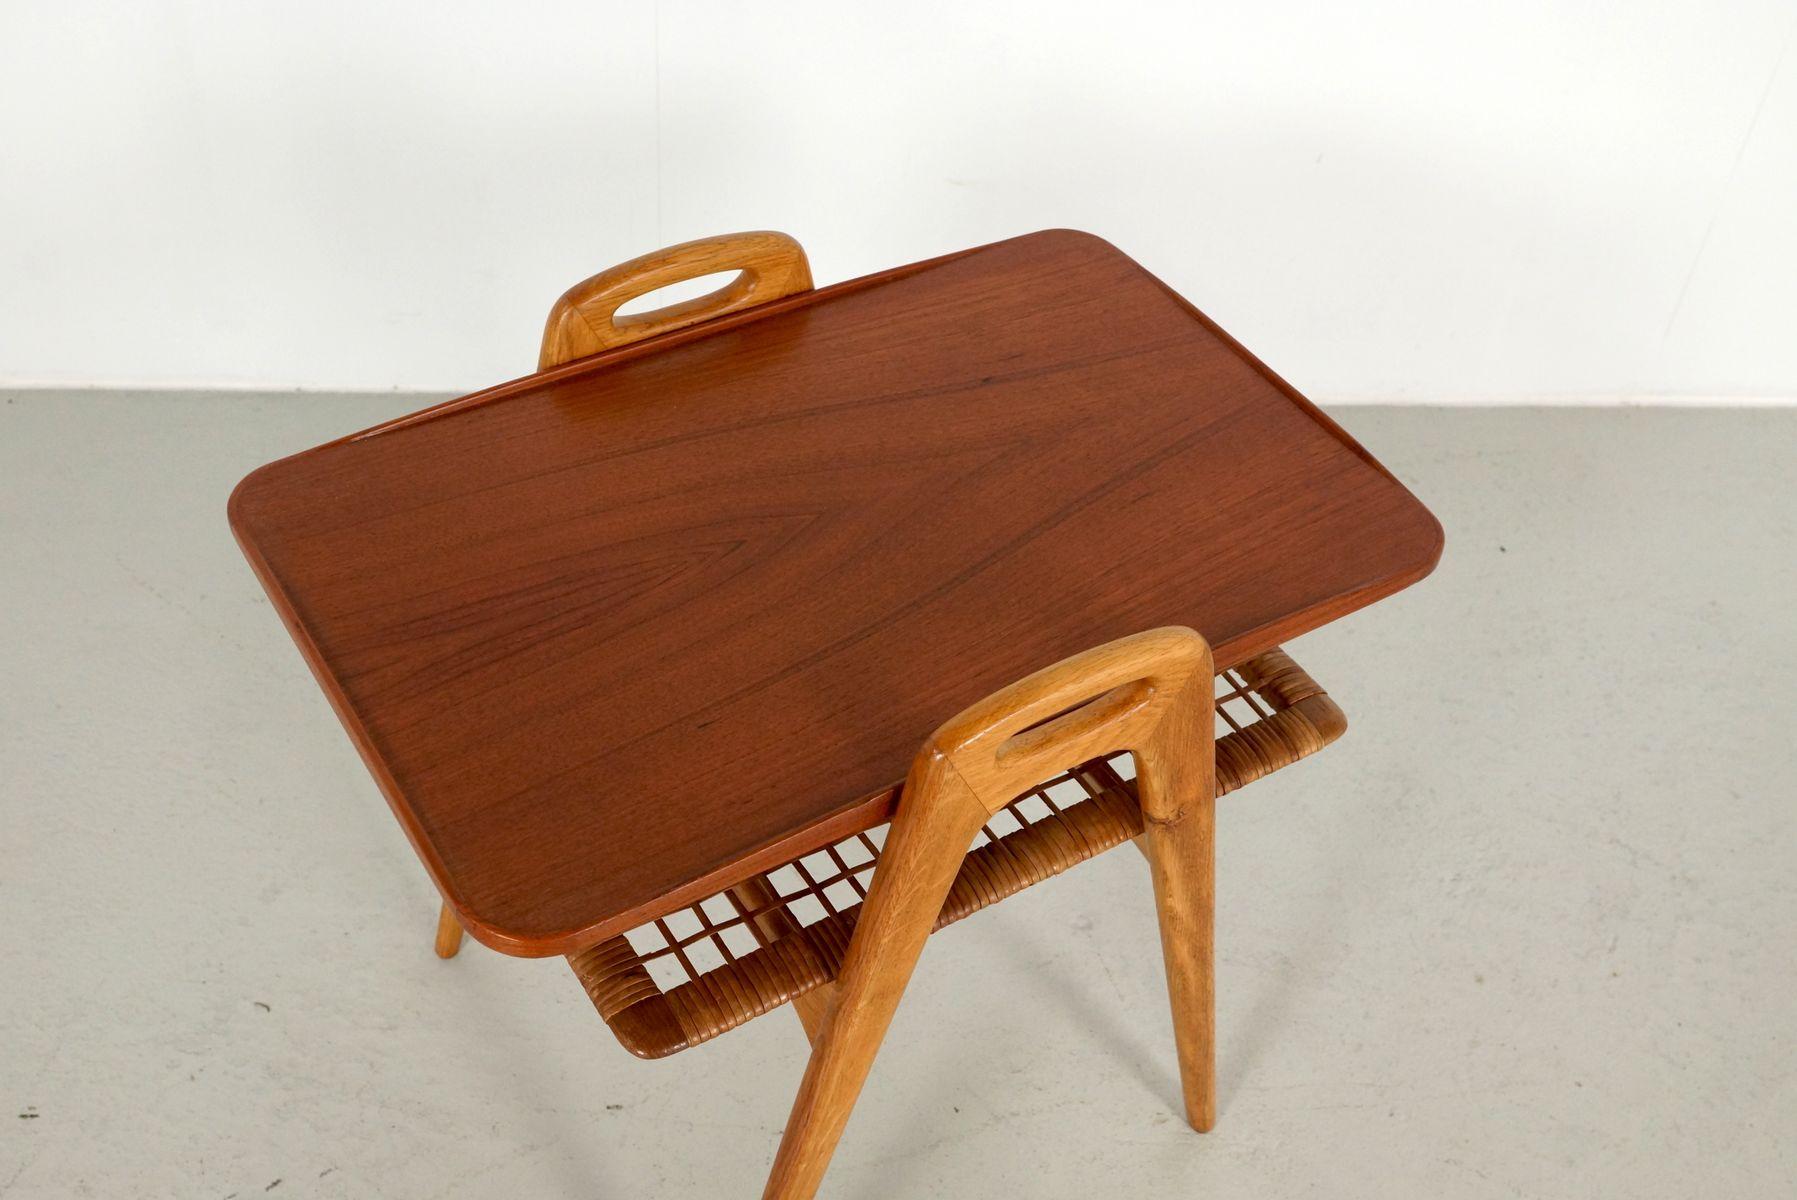 skandinavischer beistelltisch aus teak rattan 1960er. Black Bedroom Furniture Sets. Home Design Ideas